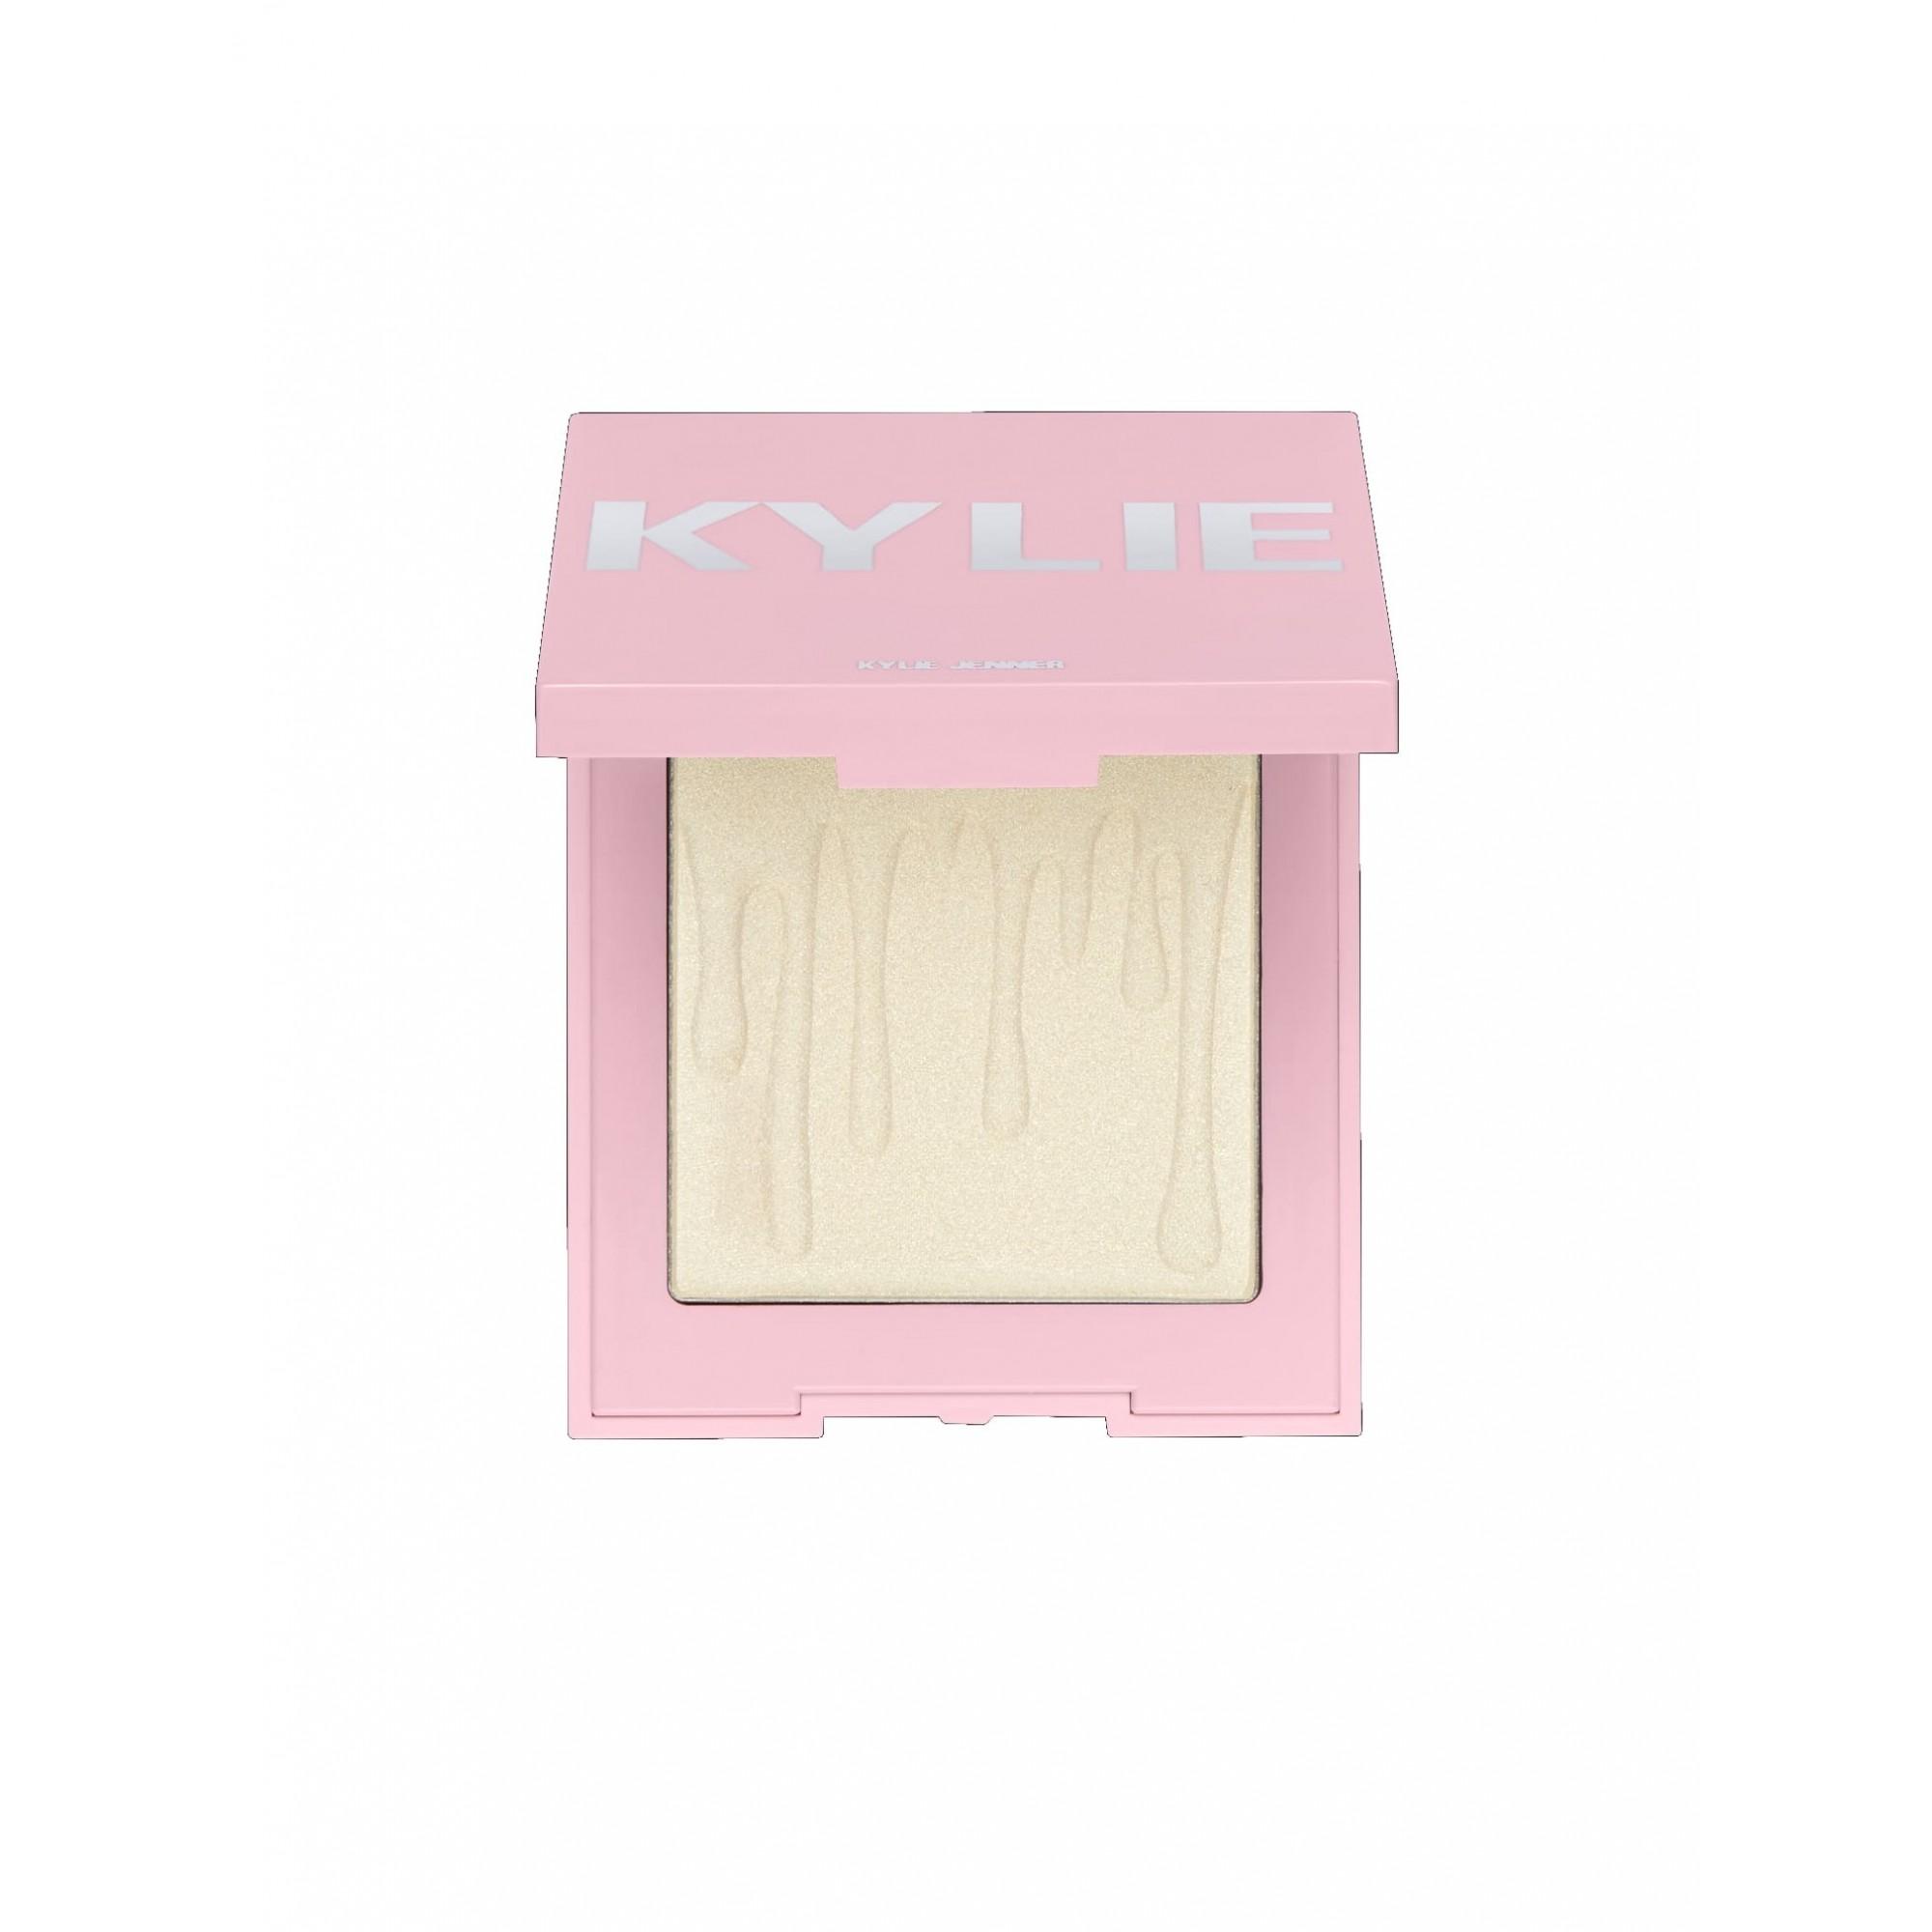 Kylie Cosmetics Quartz Kylighter